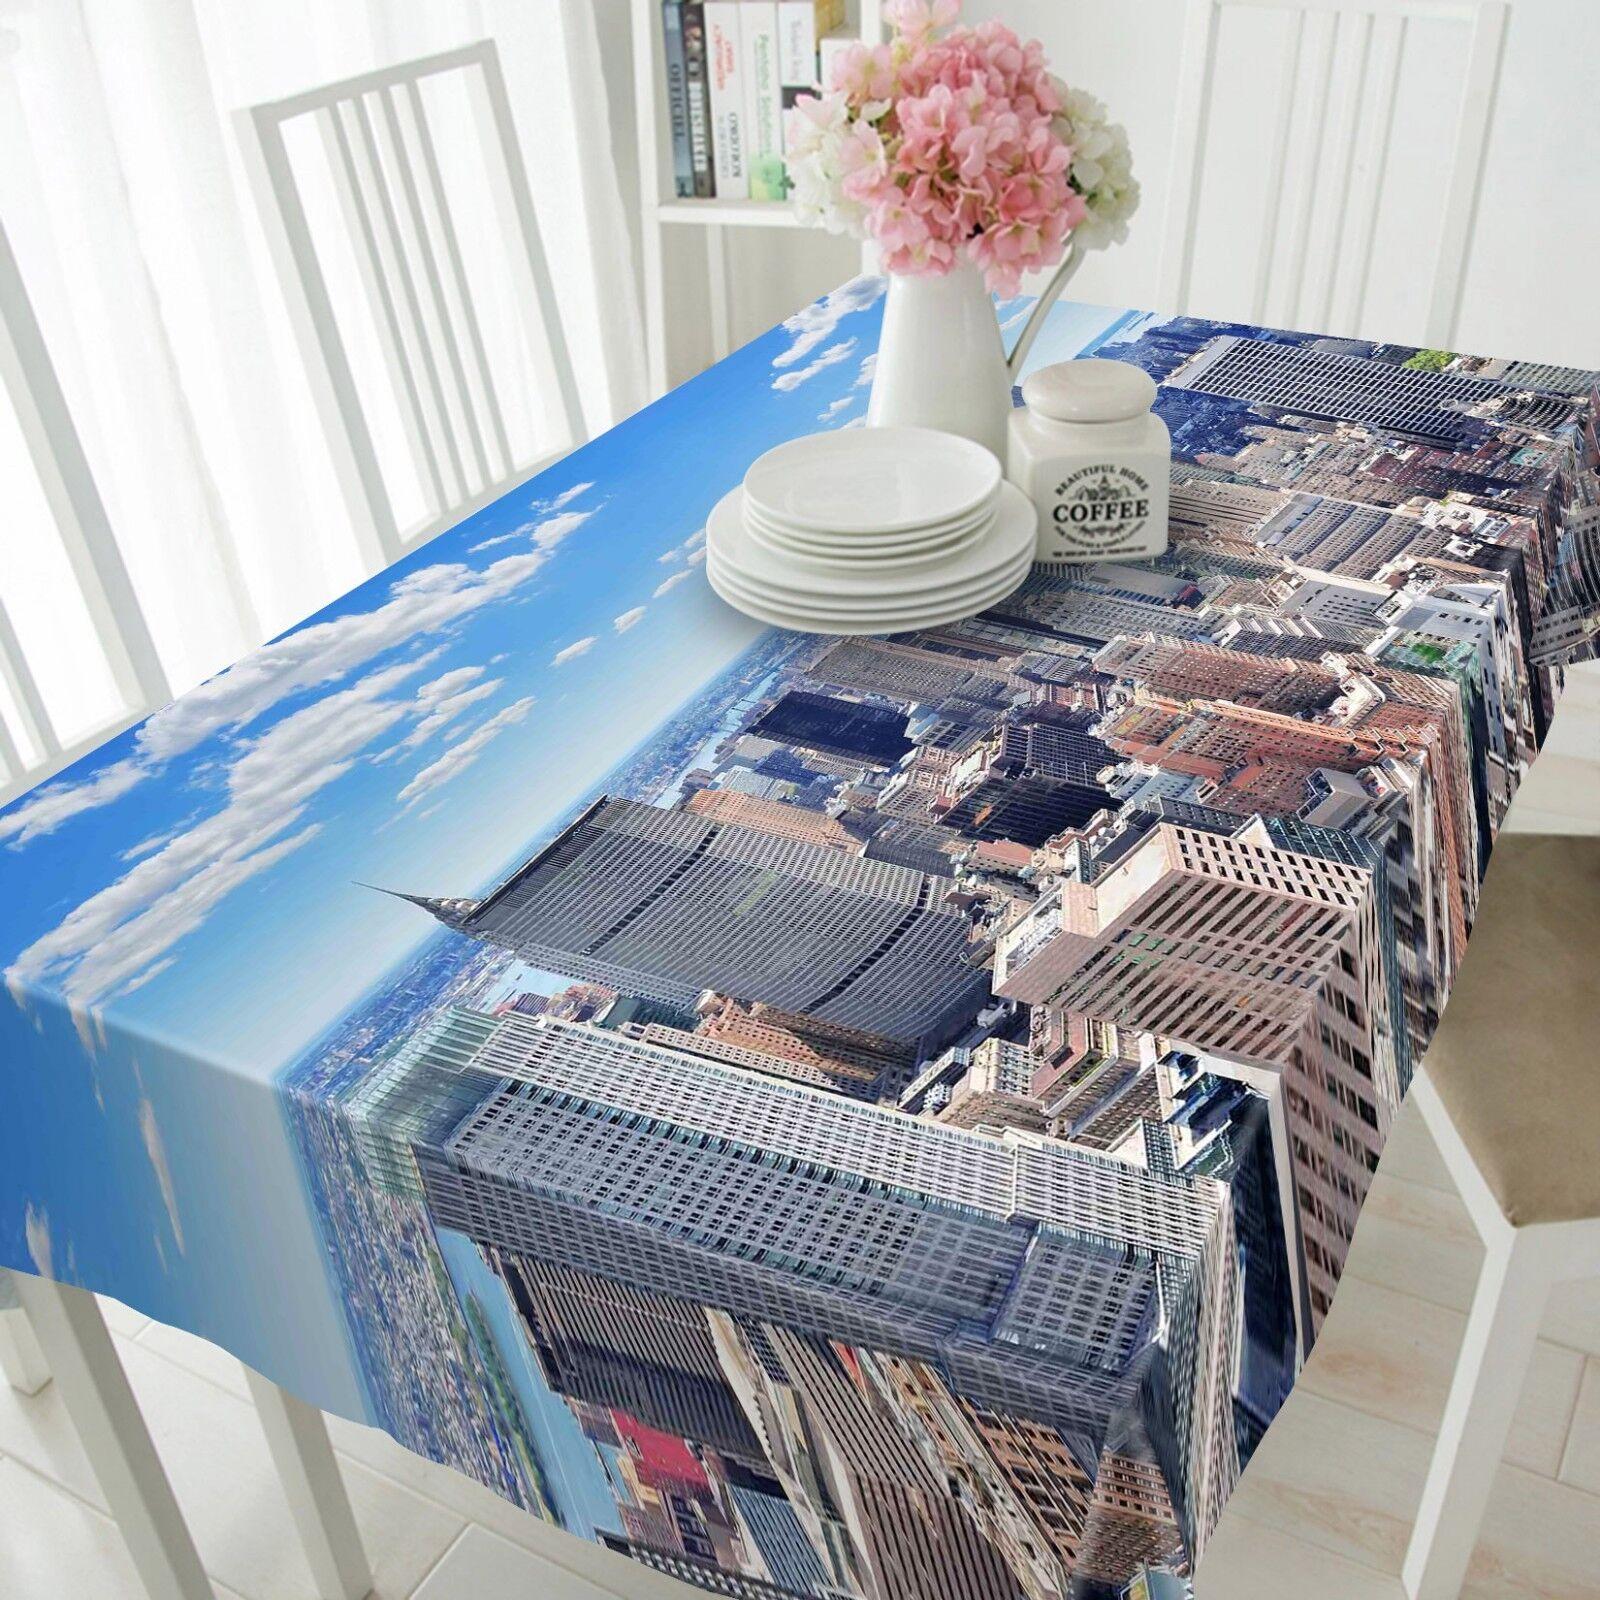 3D Tall Build 221 Tablecloth Table Cover Cloth Birthday Party Event AJ Summer